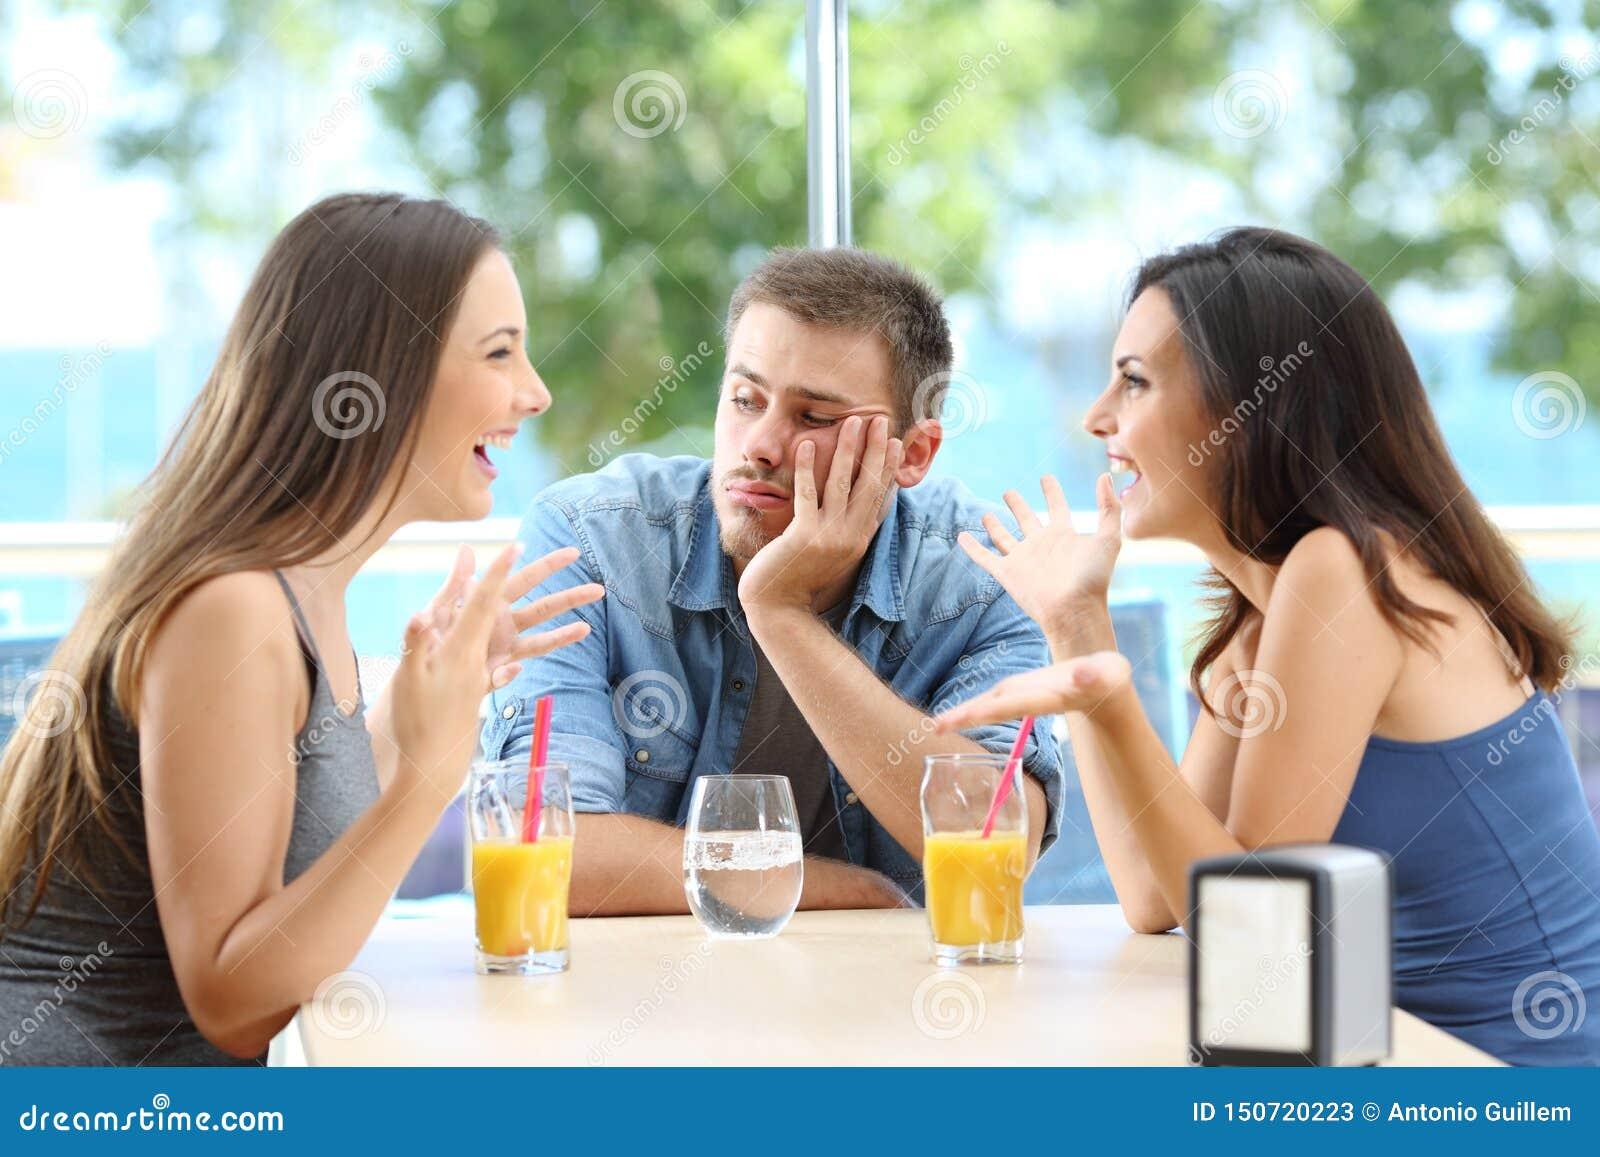 Bored man listening his friends conversation